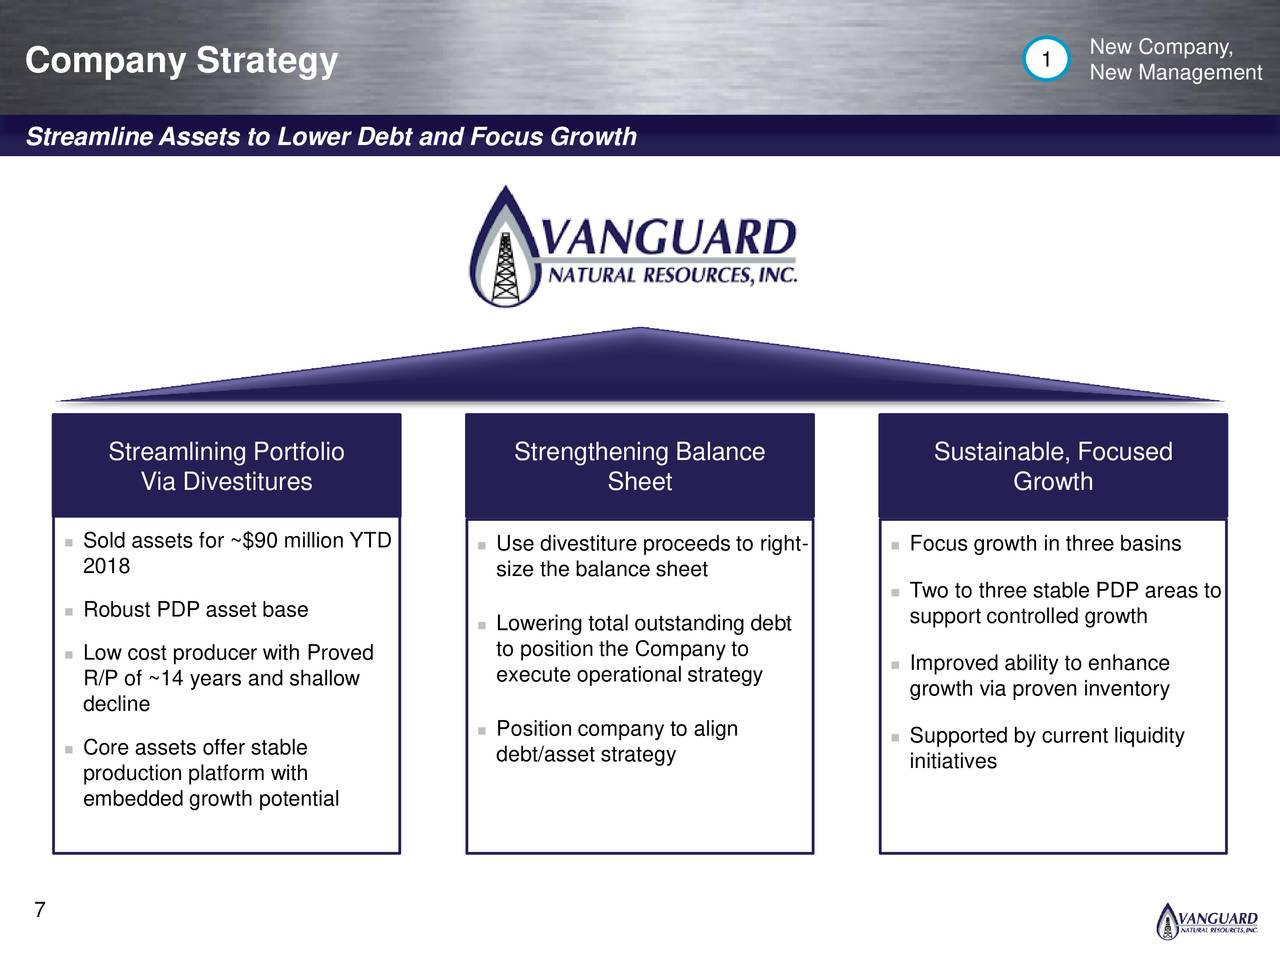 Vanguard Natural Resources Quote